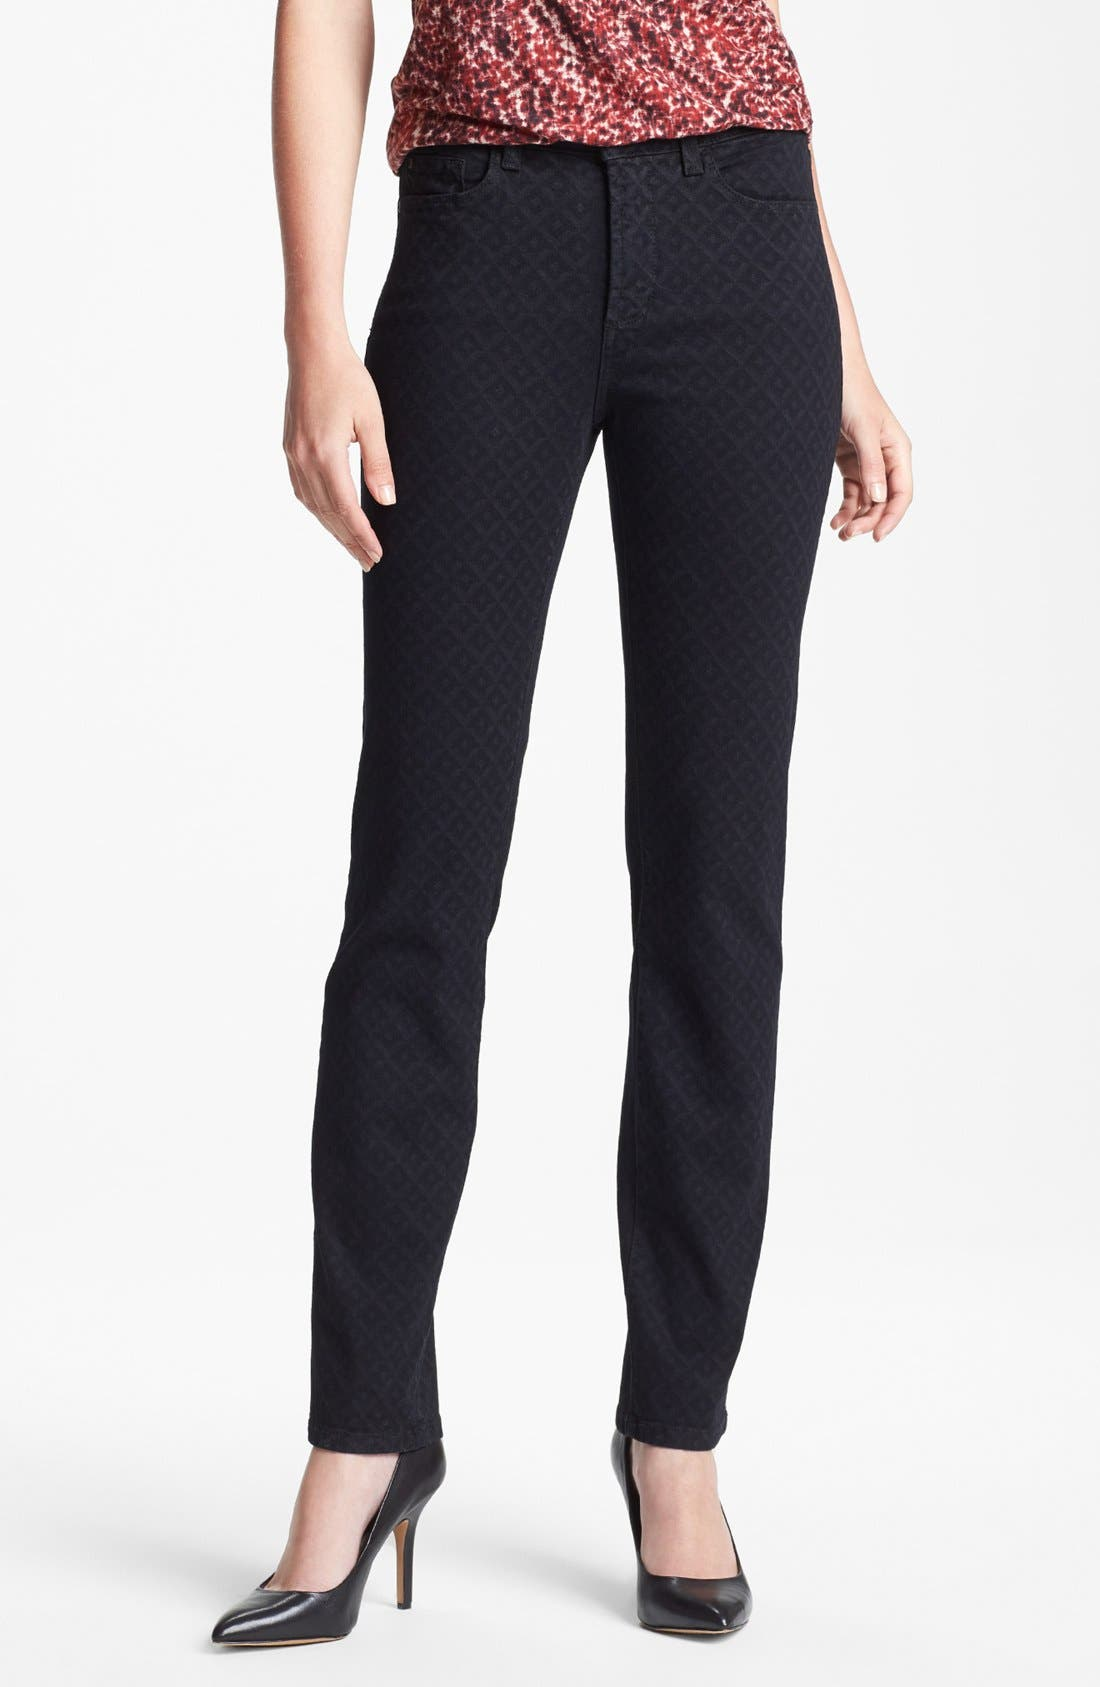 Main Image - NYDJ 'Sheri' Print Stretch Skinny Jeans (Regular & Petite)